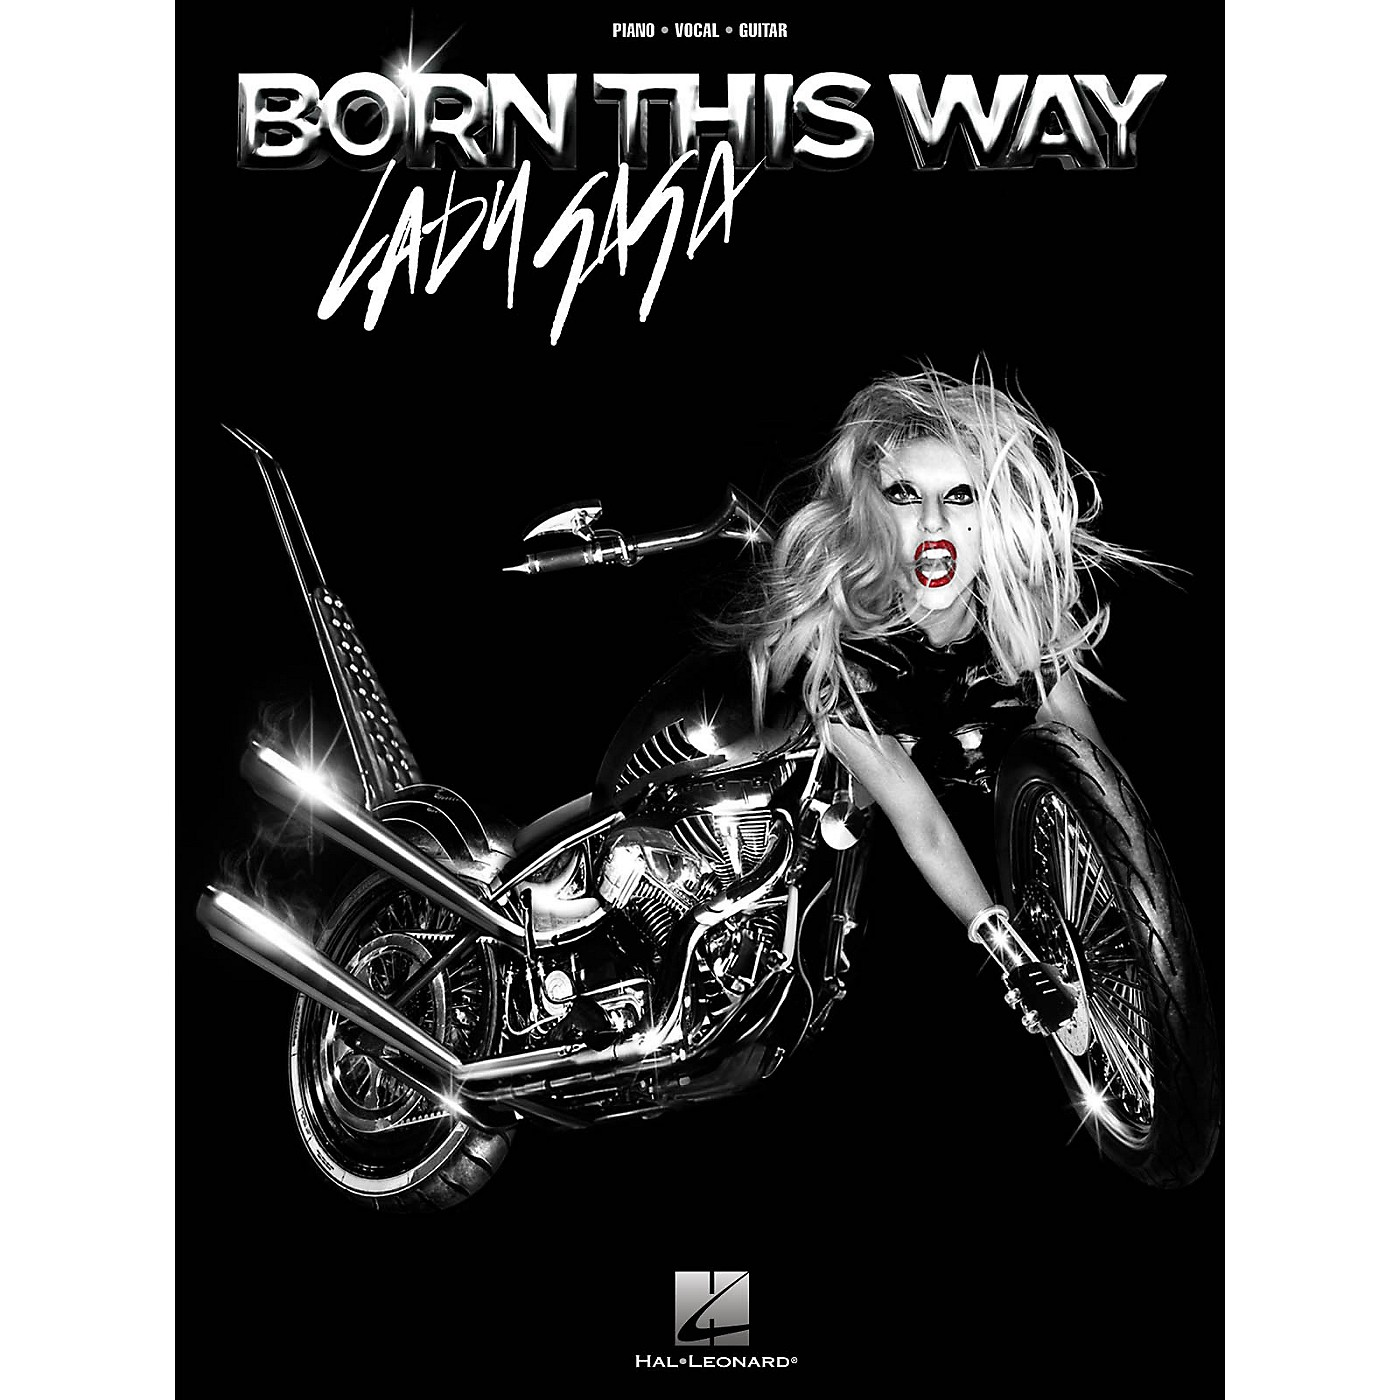 Hal Leonard Lady Gaga: Born This Way PVG Songbook thumbnail